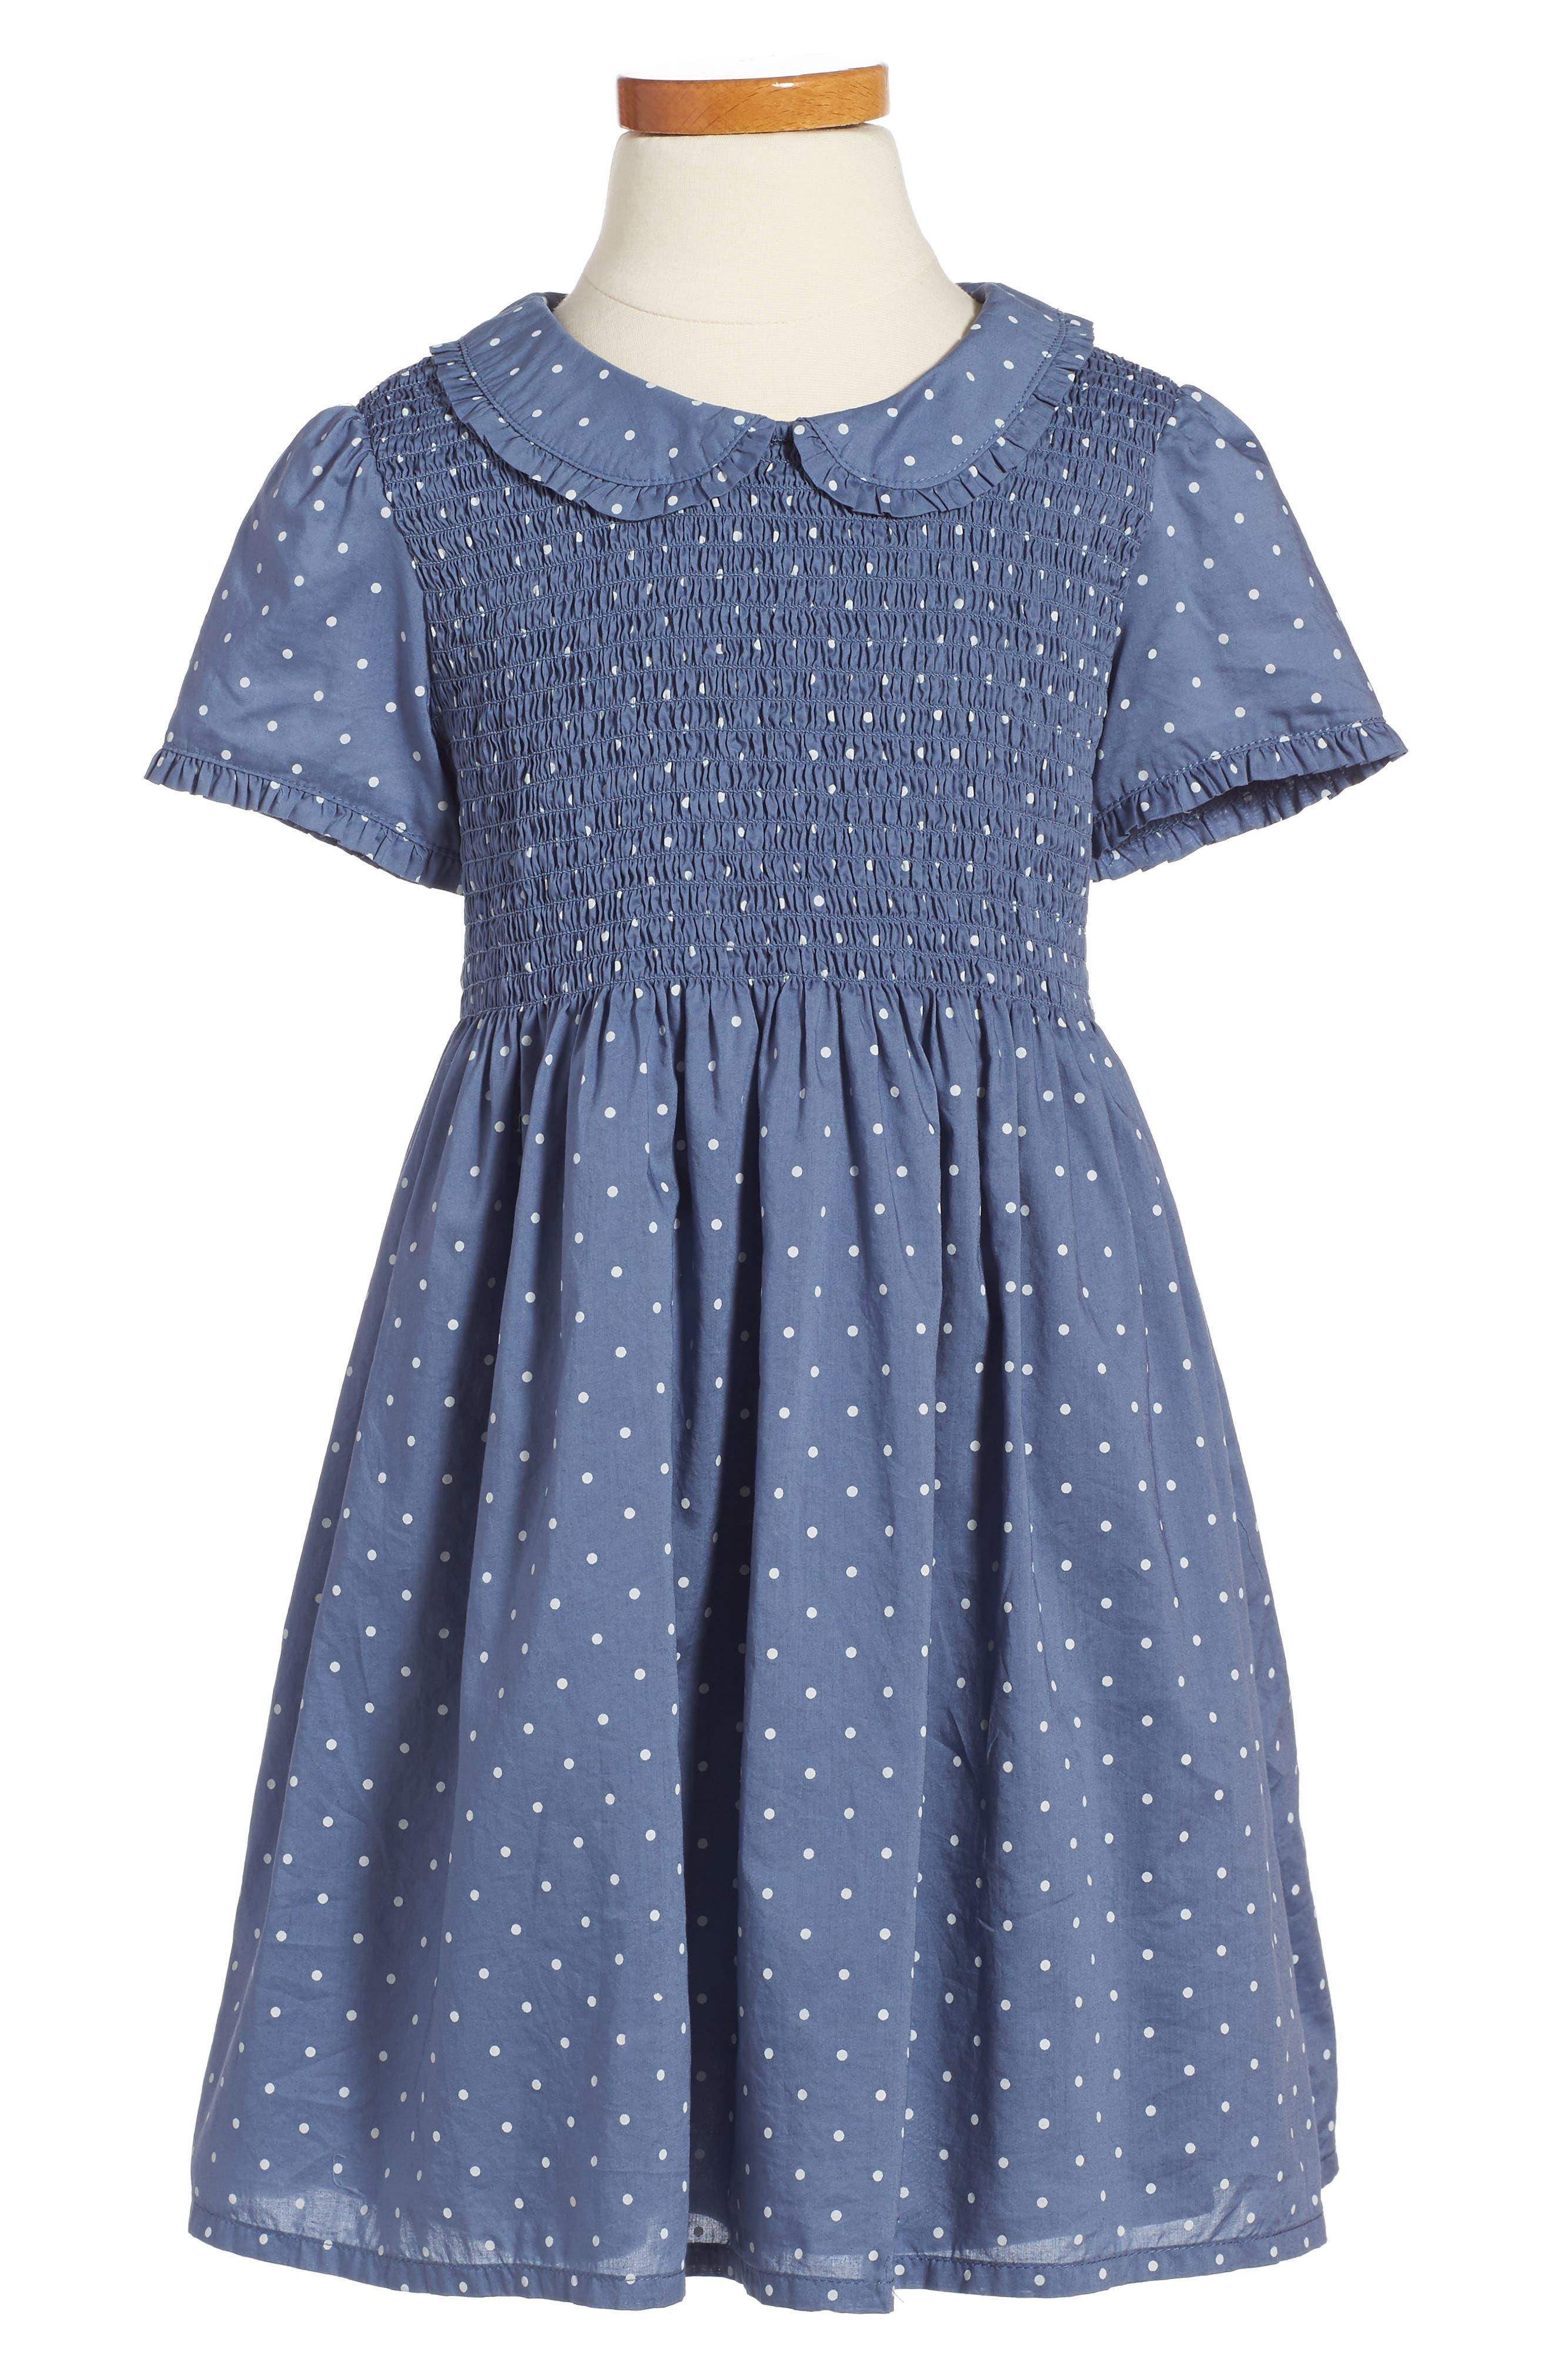 Main Image - Mini Boden Pretty Smock Dress (Toddler Girls, Little Girls & Big Girls)